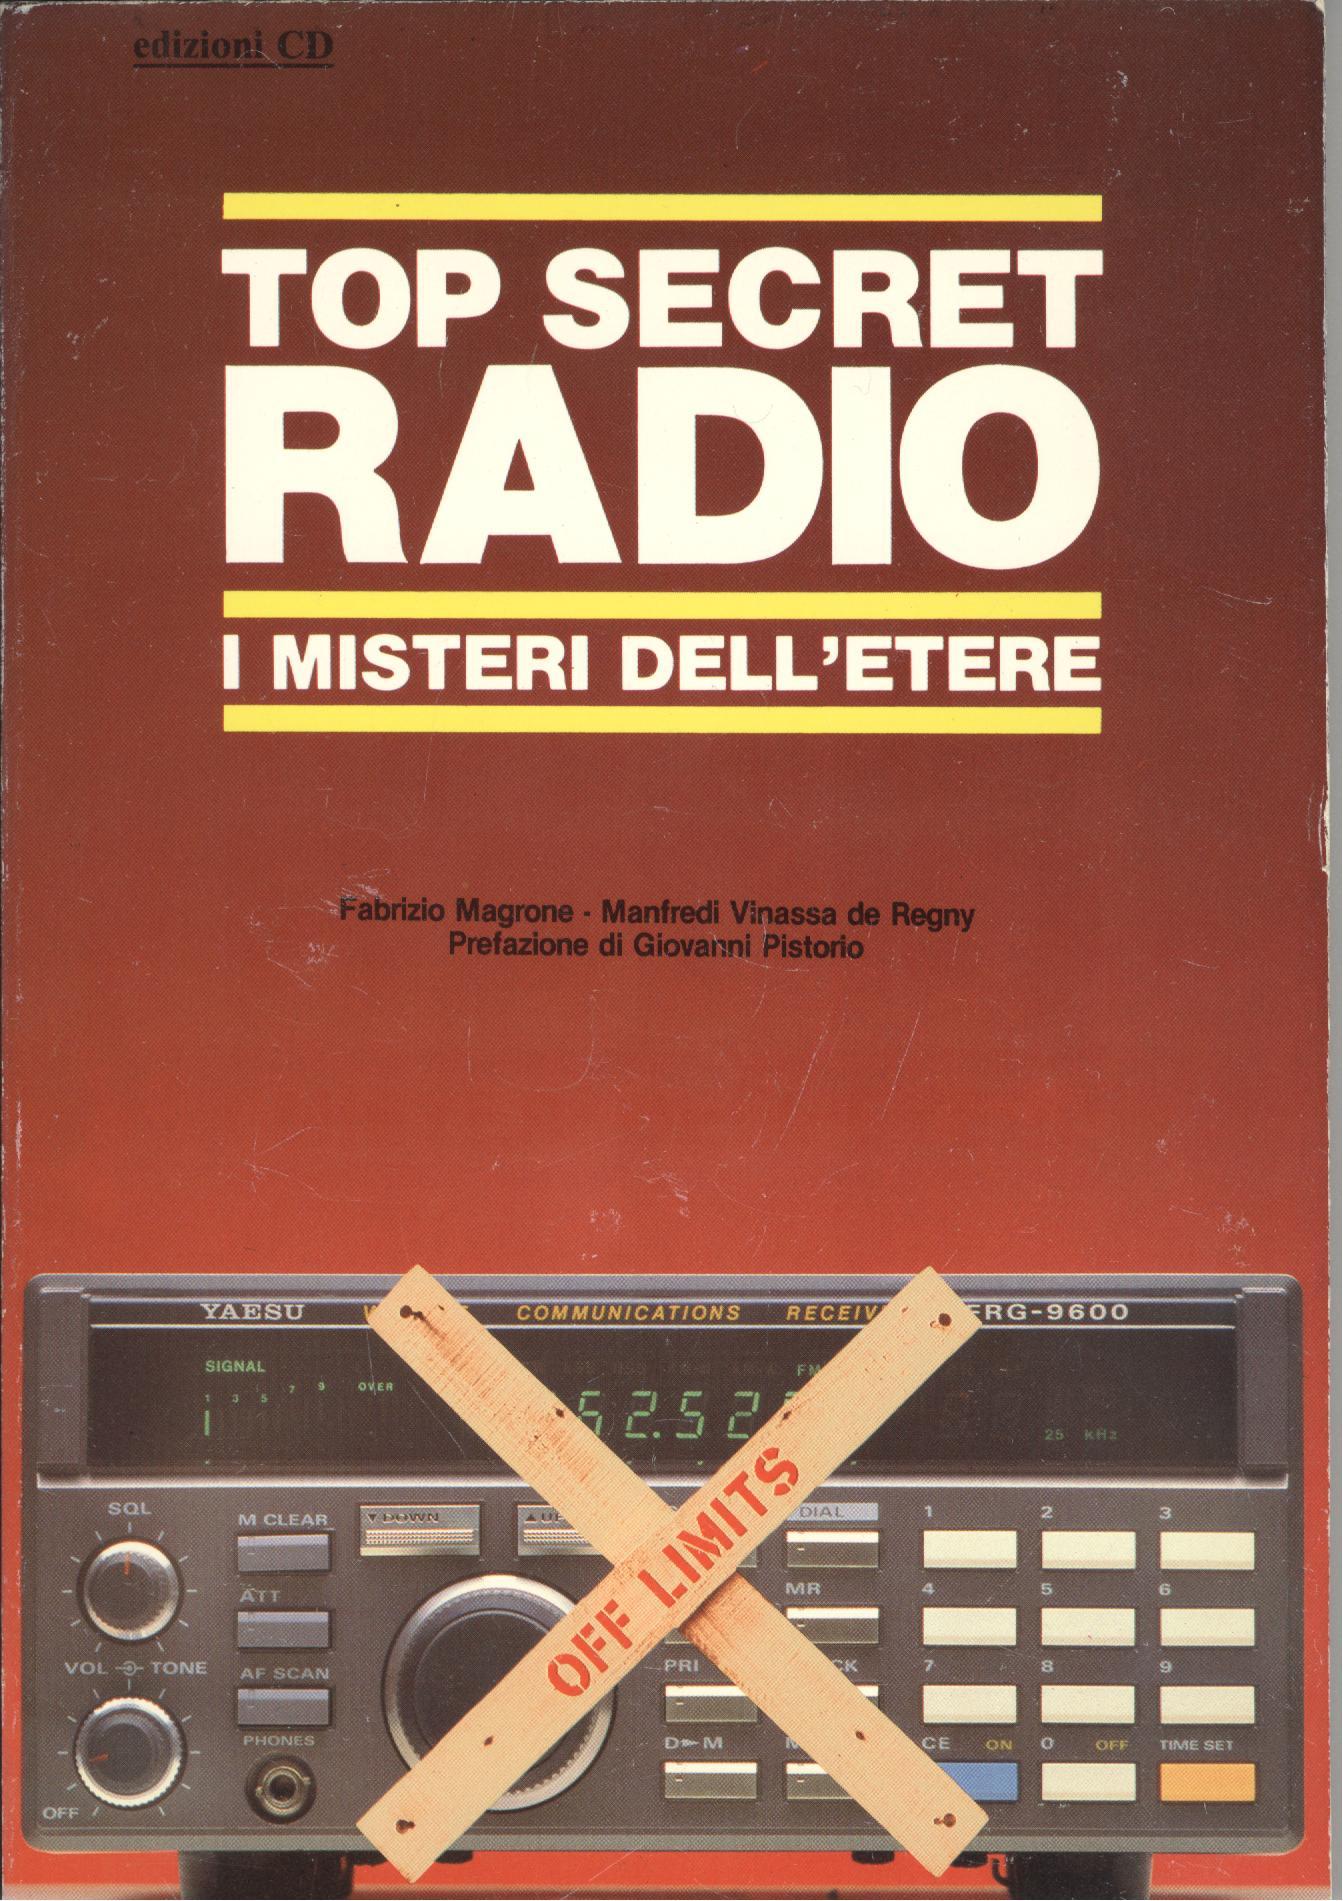 Top Secret Radio